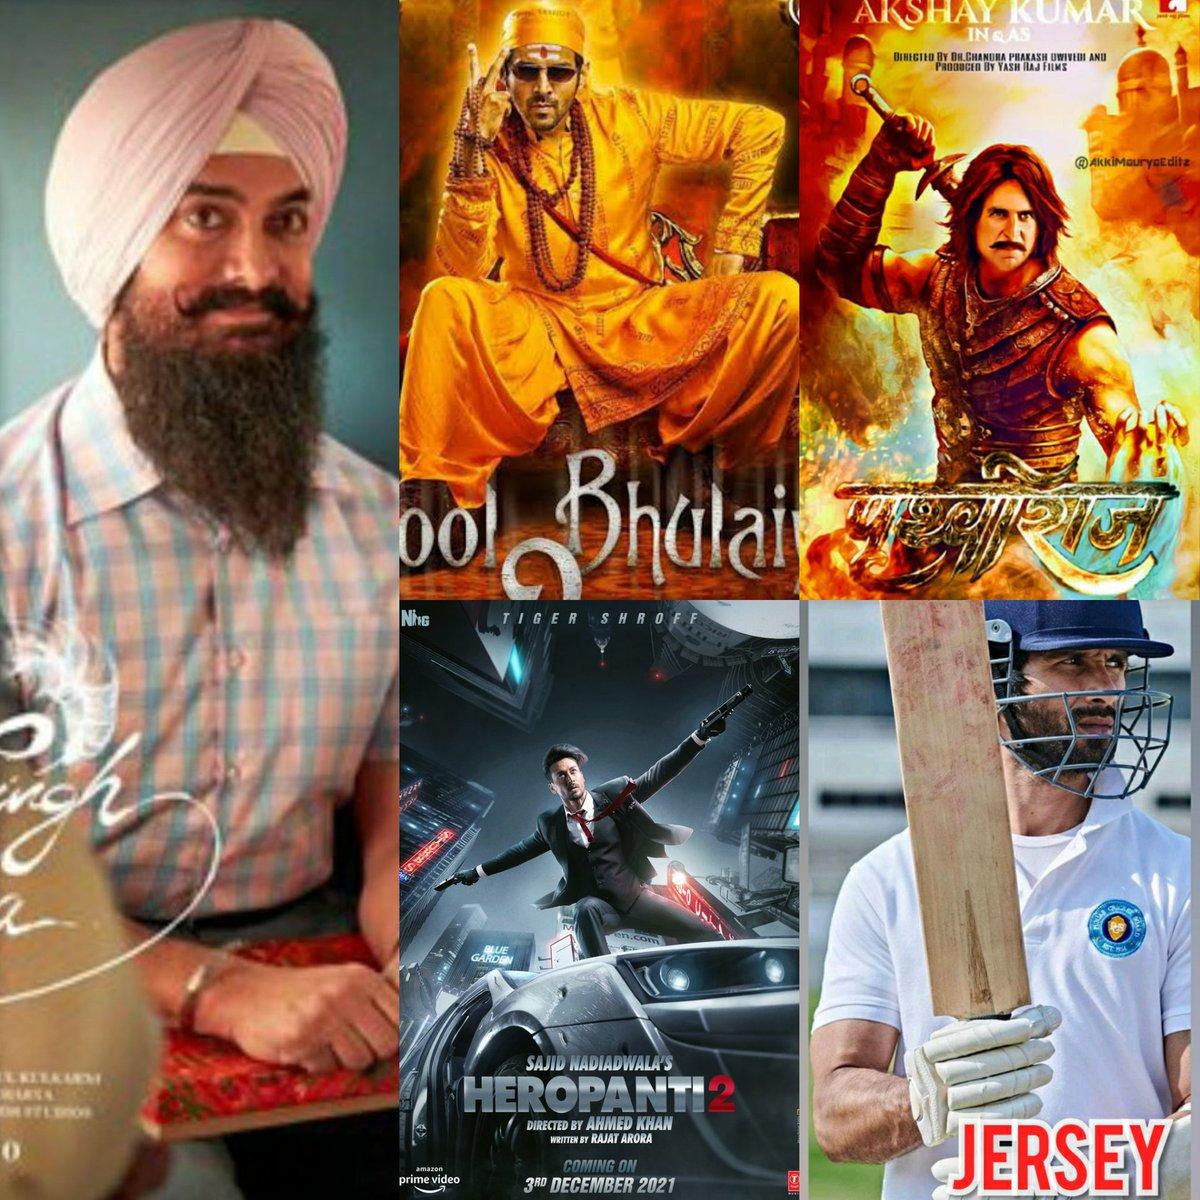 Official Release Date Of Prominent #HINDI Movies... 2021 Schedule 🎬 🎬 #Prithviraj: 5 Nov [#Diwali] 🎬 #Jersey: 5 Nov [#Diwali] 🎬 #BhoolBhulaiyaa2: 19 Nov 🎬 #Heropanti2: 3 Dec 🎬 #LaalSinghChaddha: #Christmas  [date to be announced]